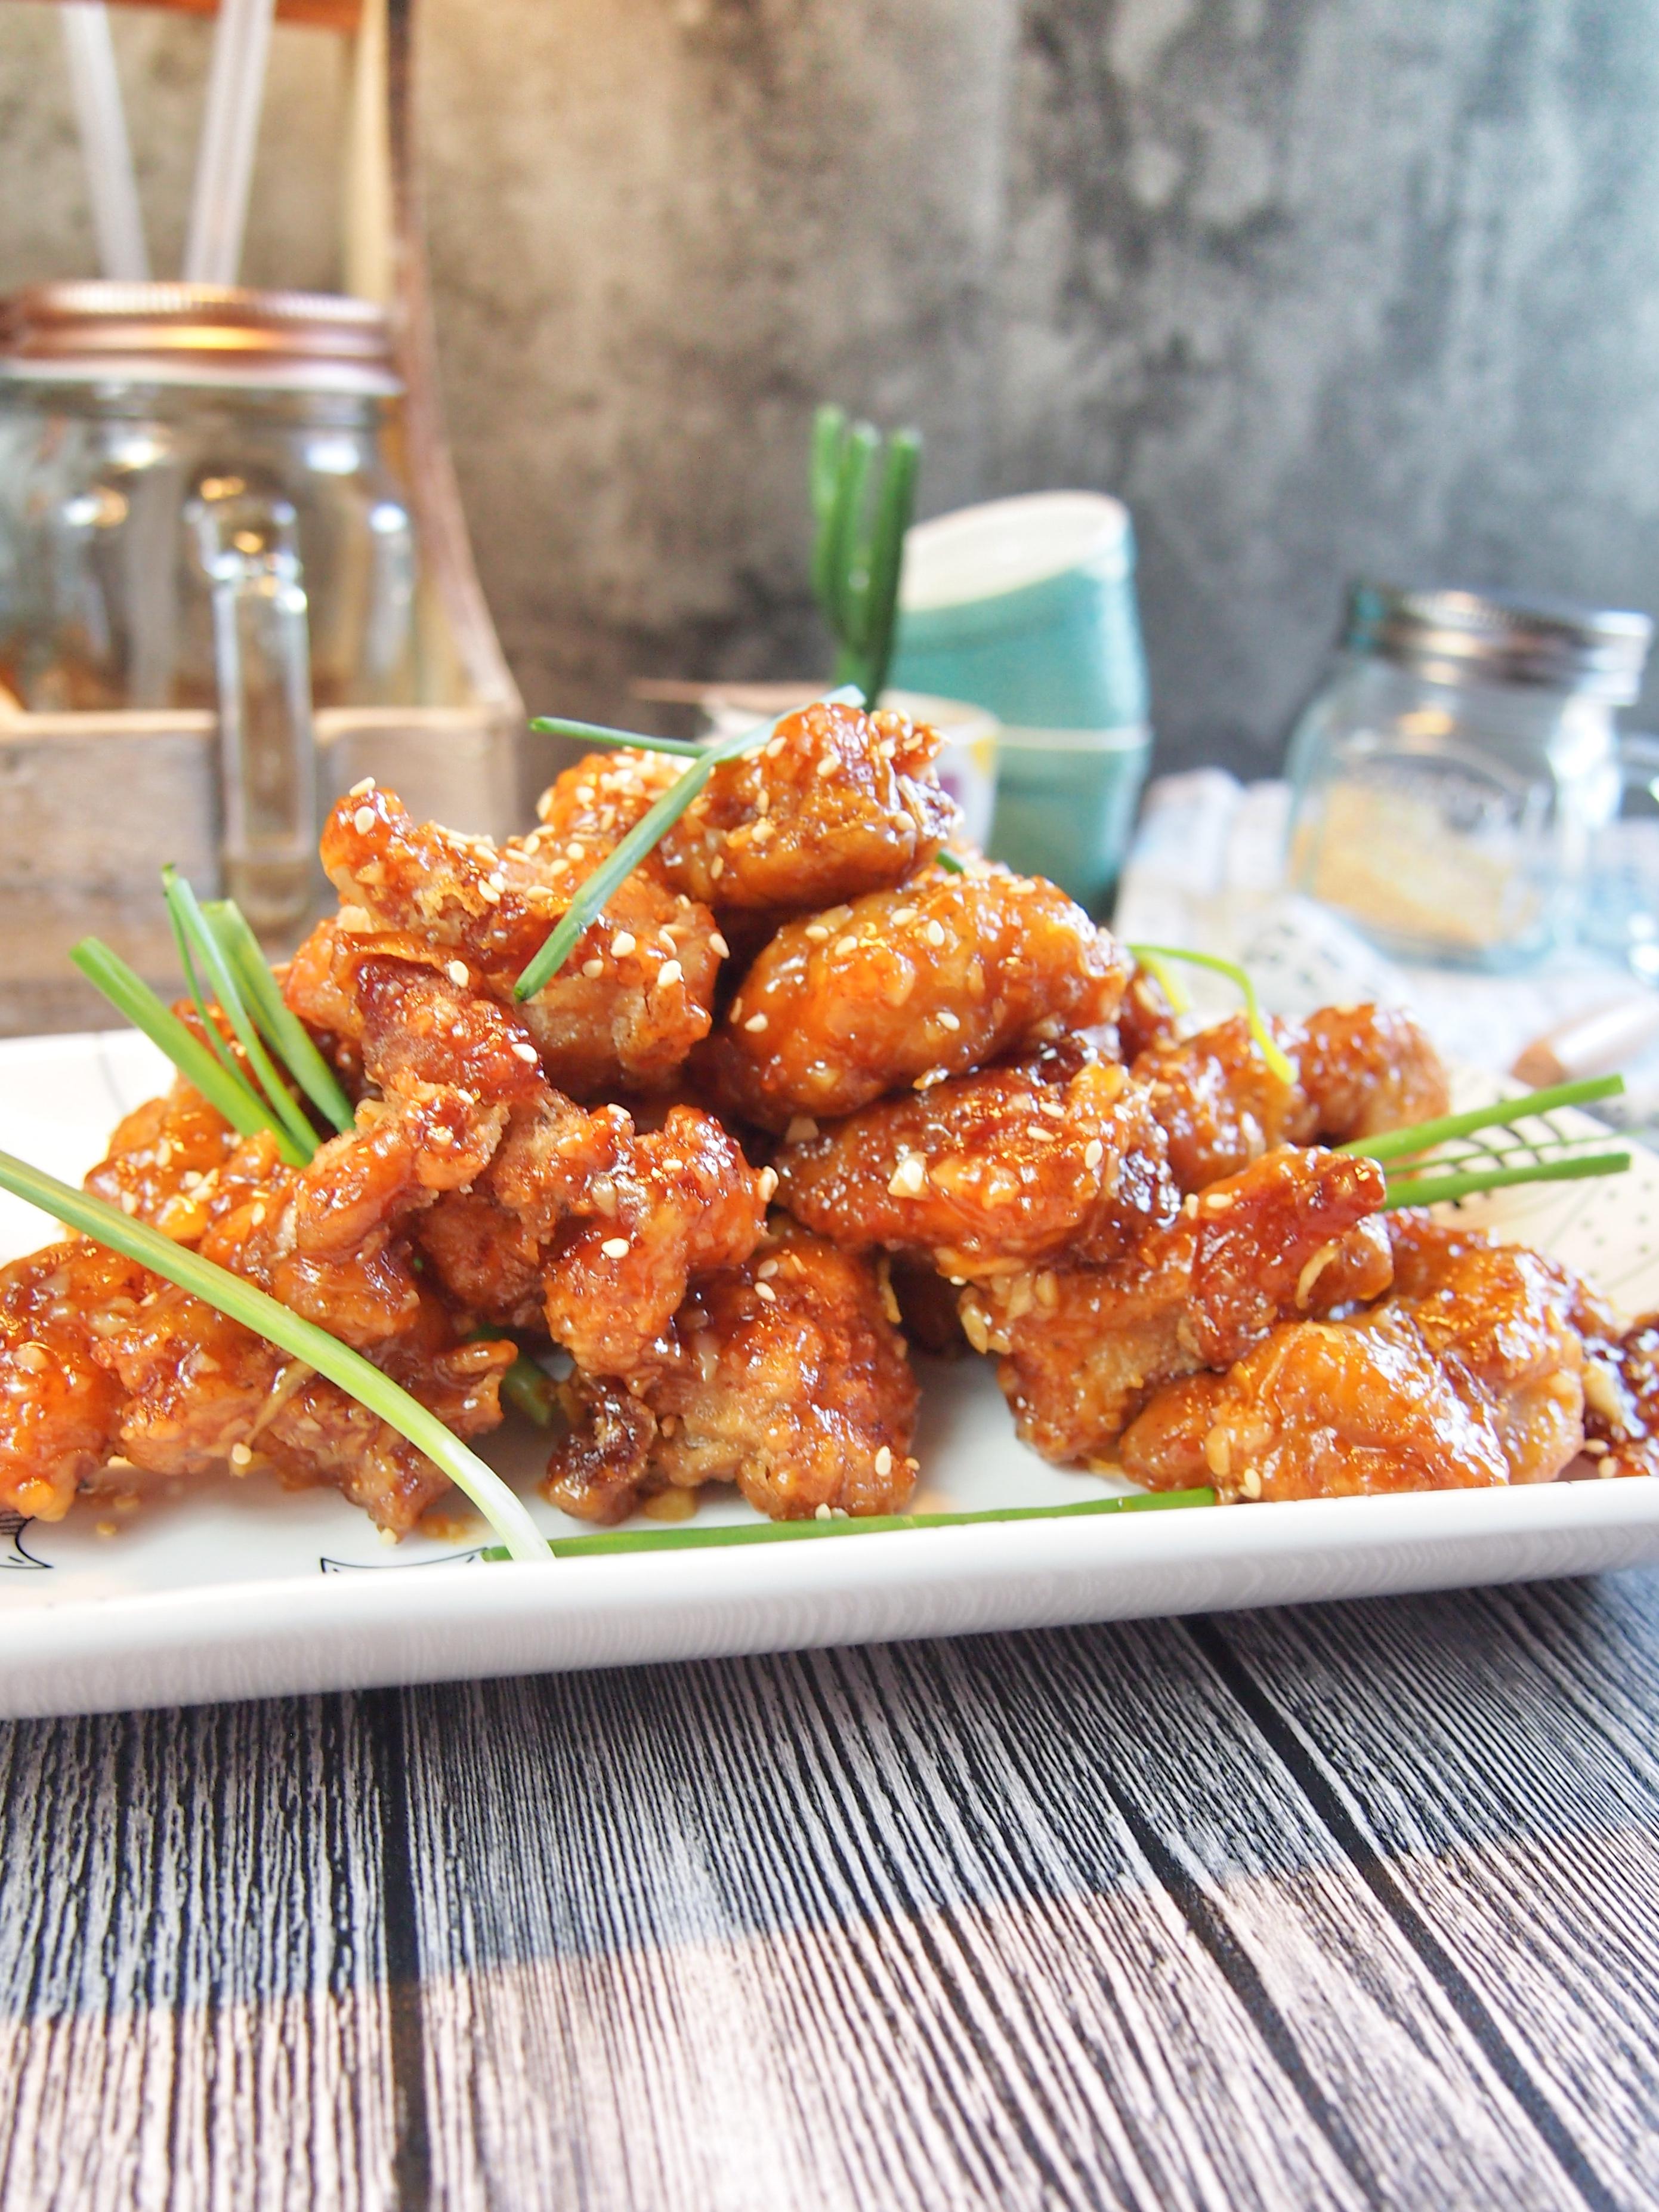 Super Easy Chinese Honey Chicken Recipe 蜜糖鸡 - Spice N' Pans